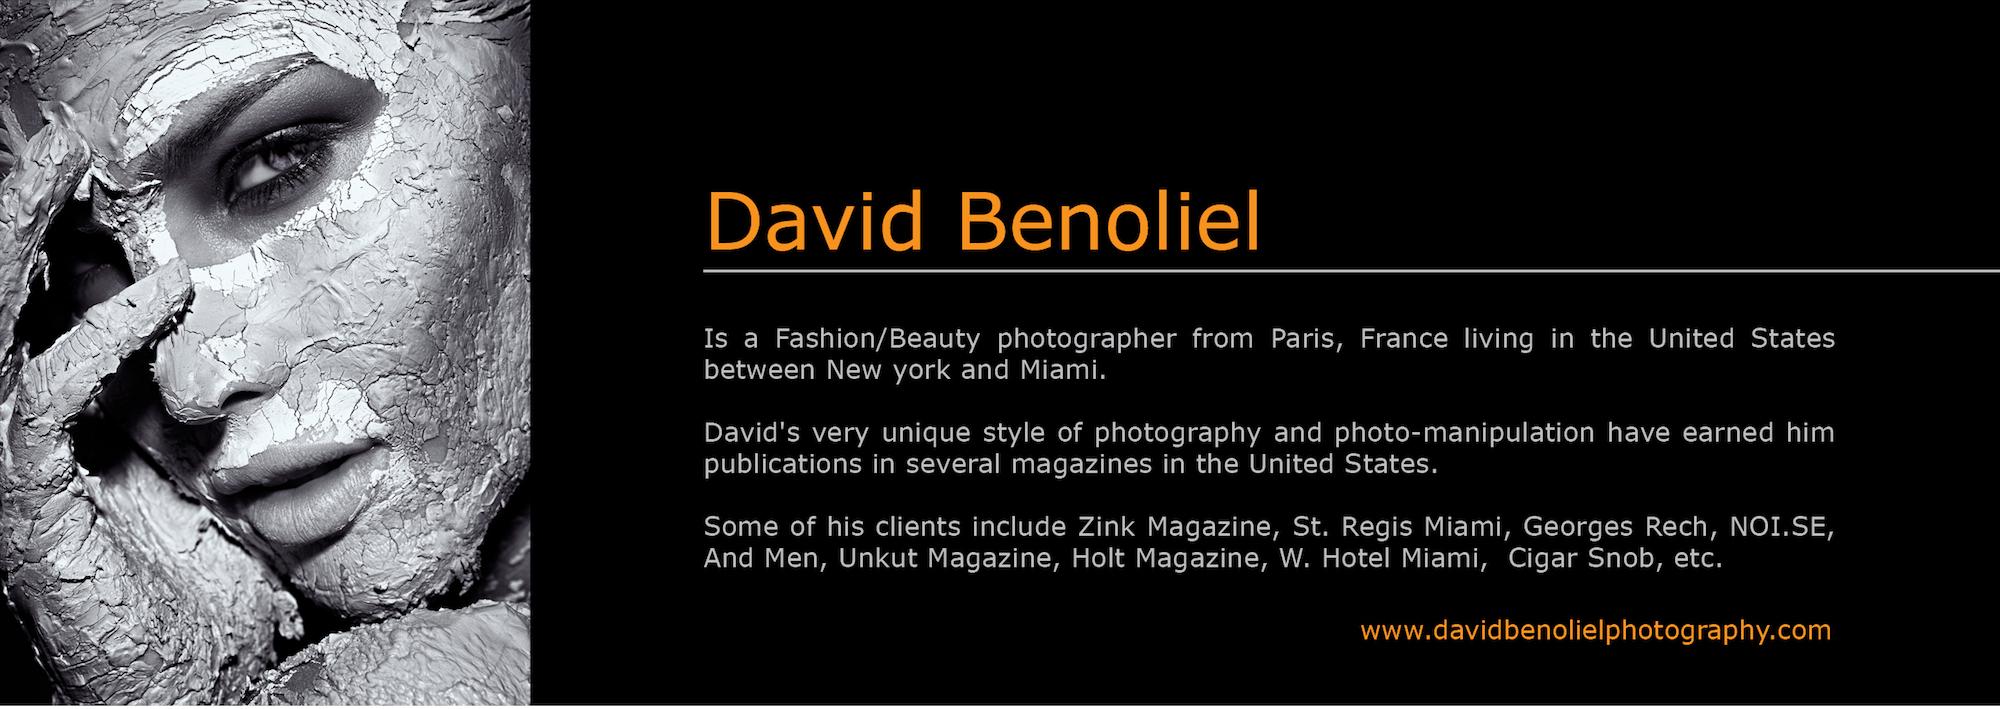 David Benoliel_04.jpg